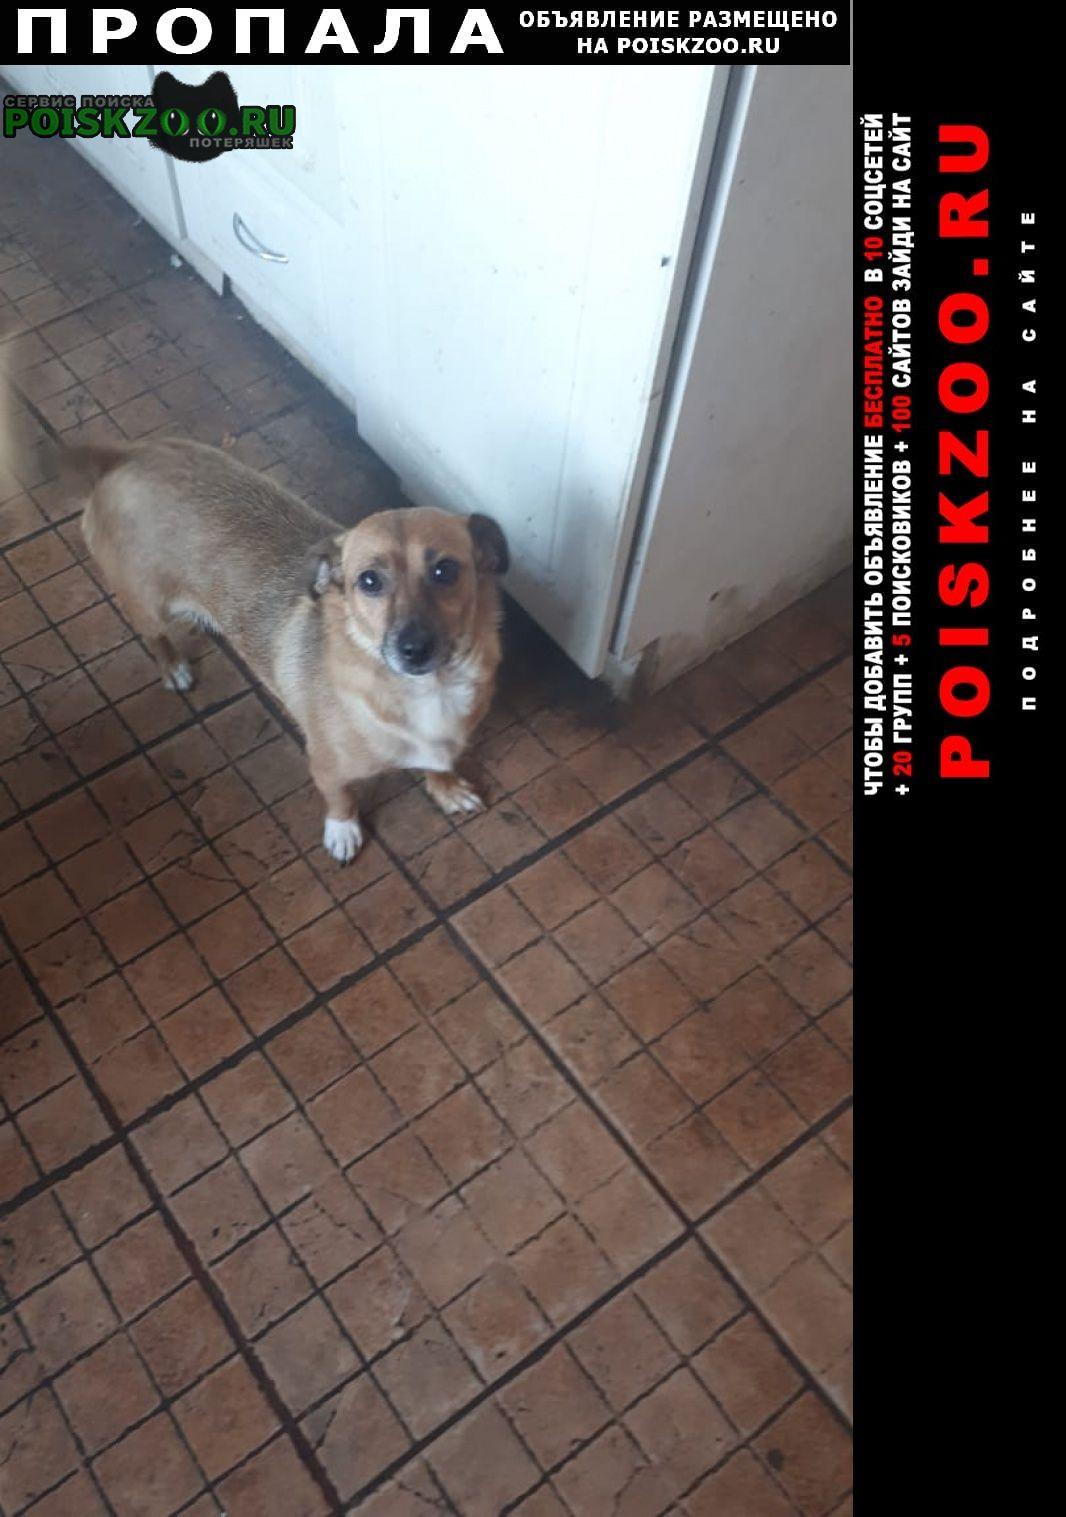 Ставрополь Пропала собака собачка